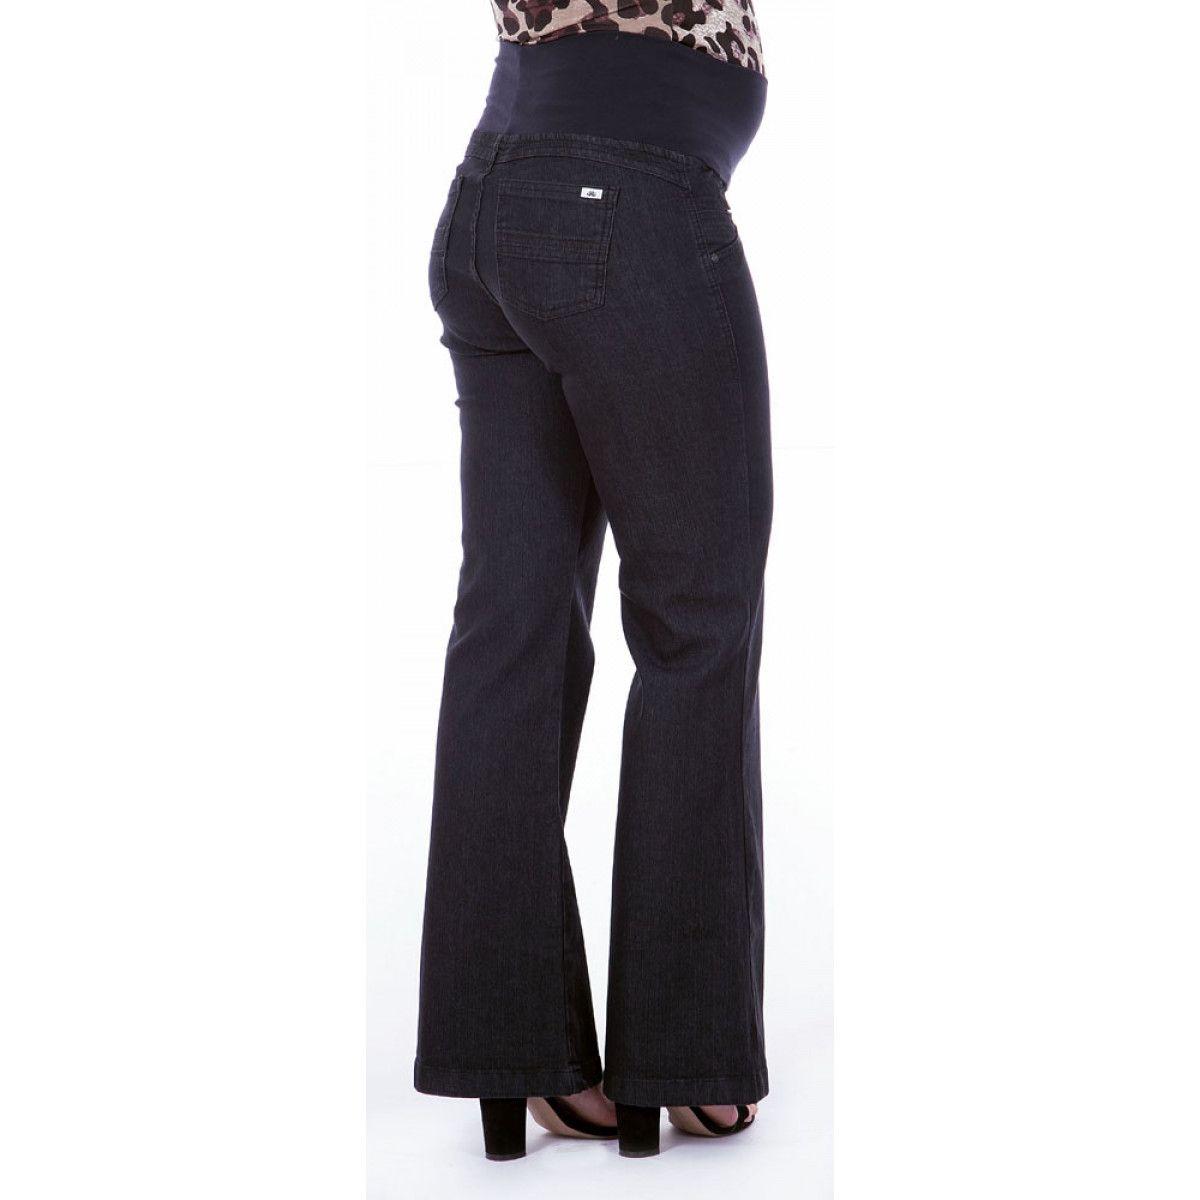 fccdfc645 Calça Jeans Gestante Emily Flare - Preto